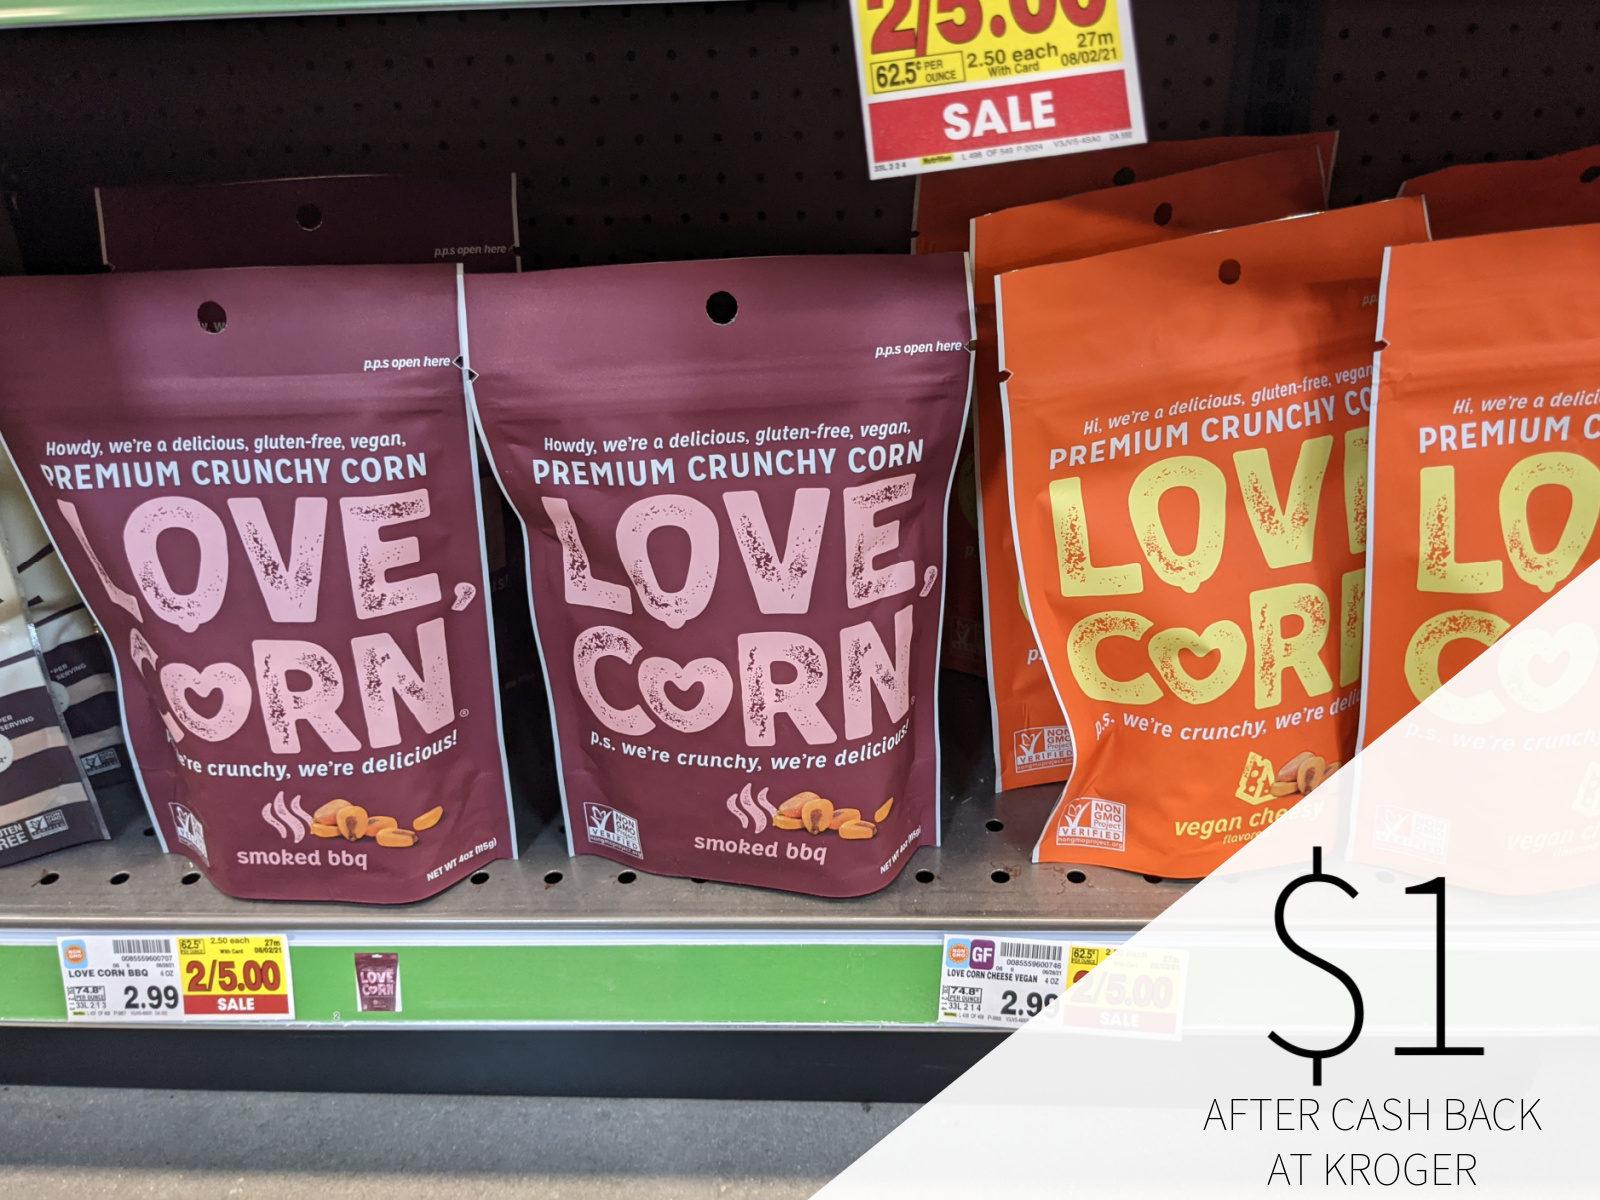 Love Corn Premium Crunch Corn Only  At Kroger